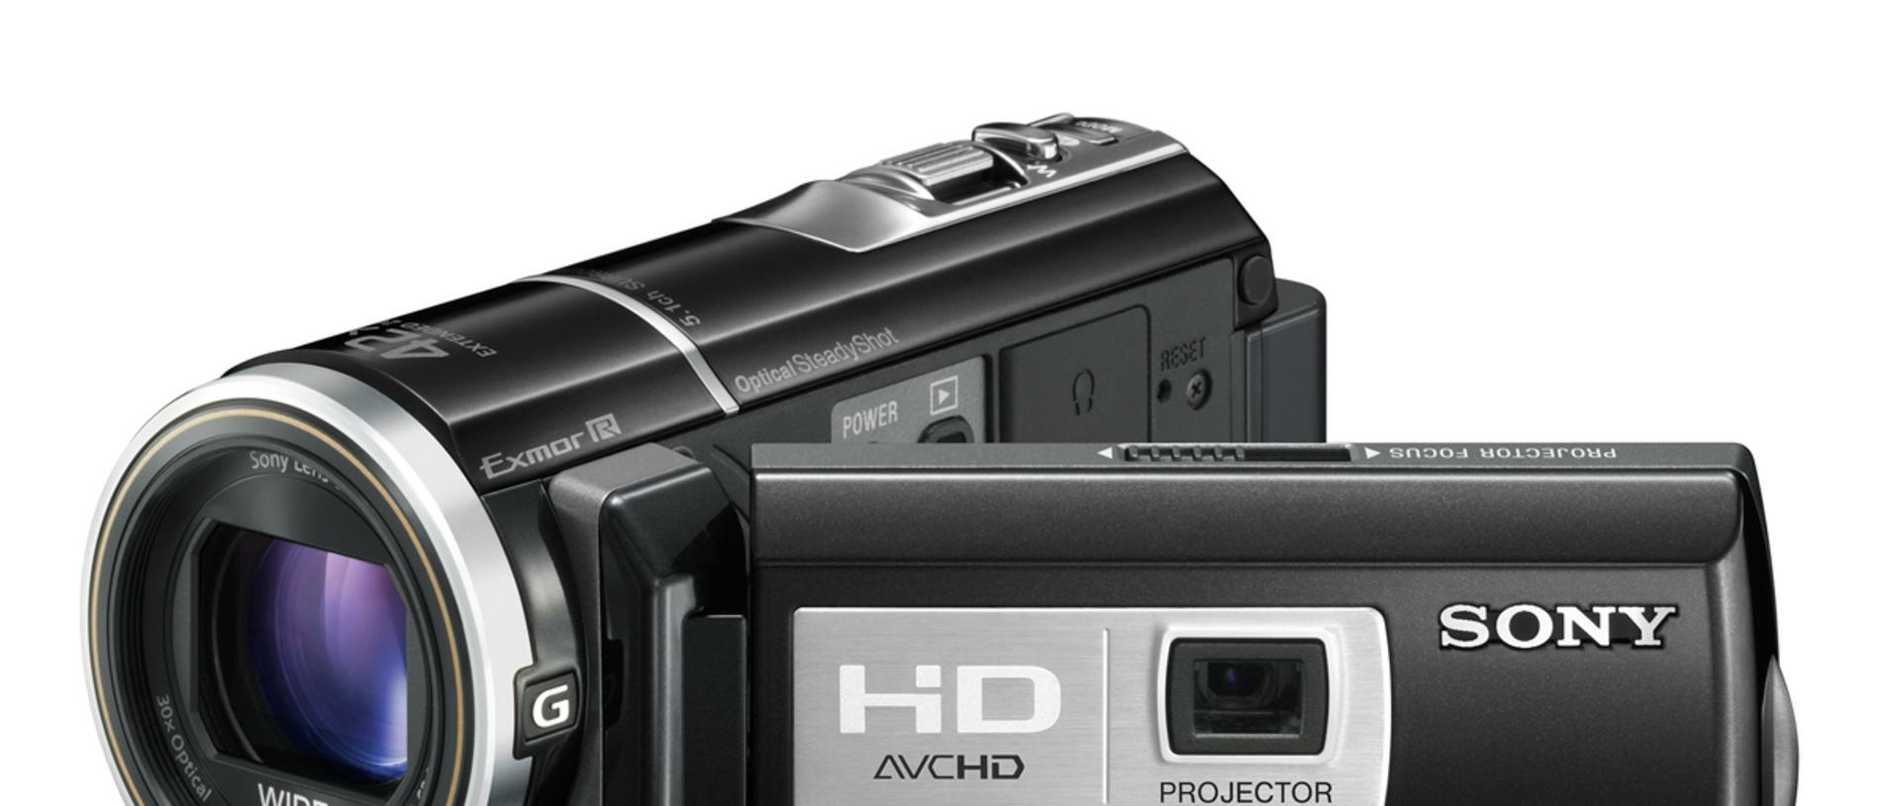 Sony HDR-PJ10 video camera.